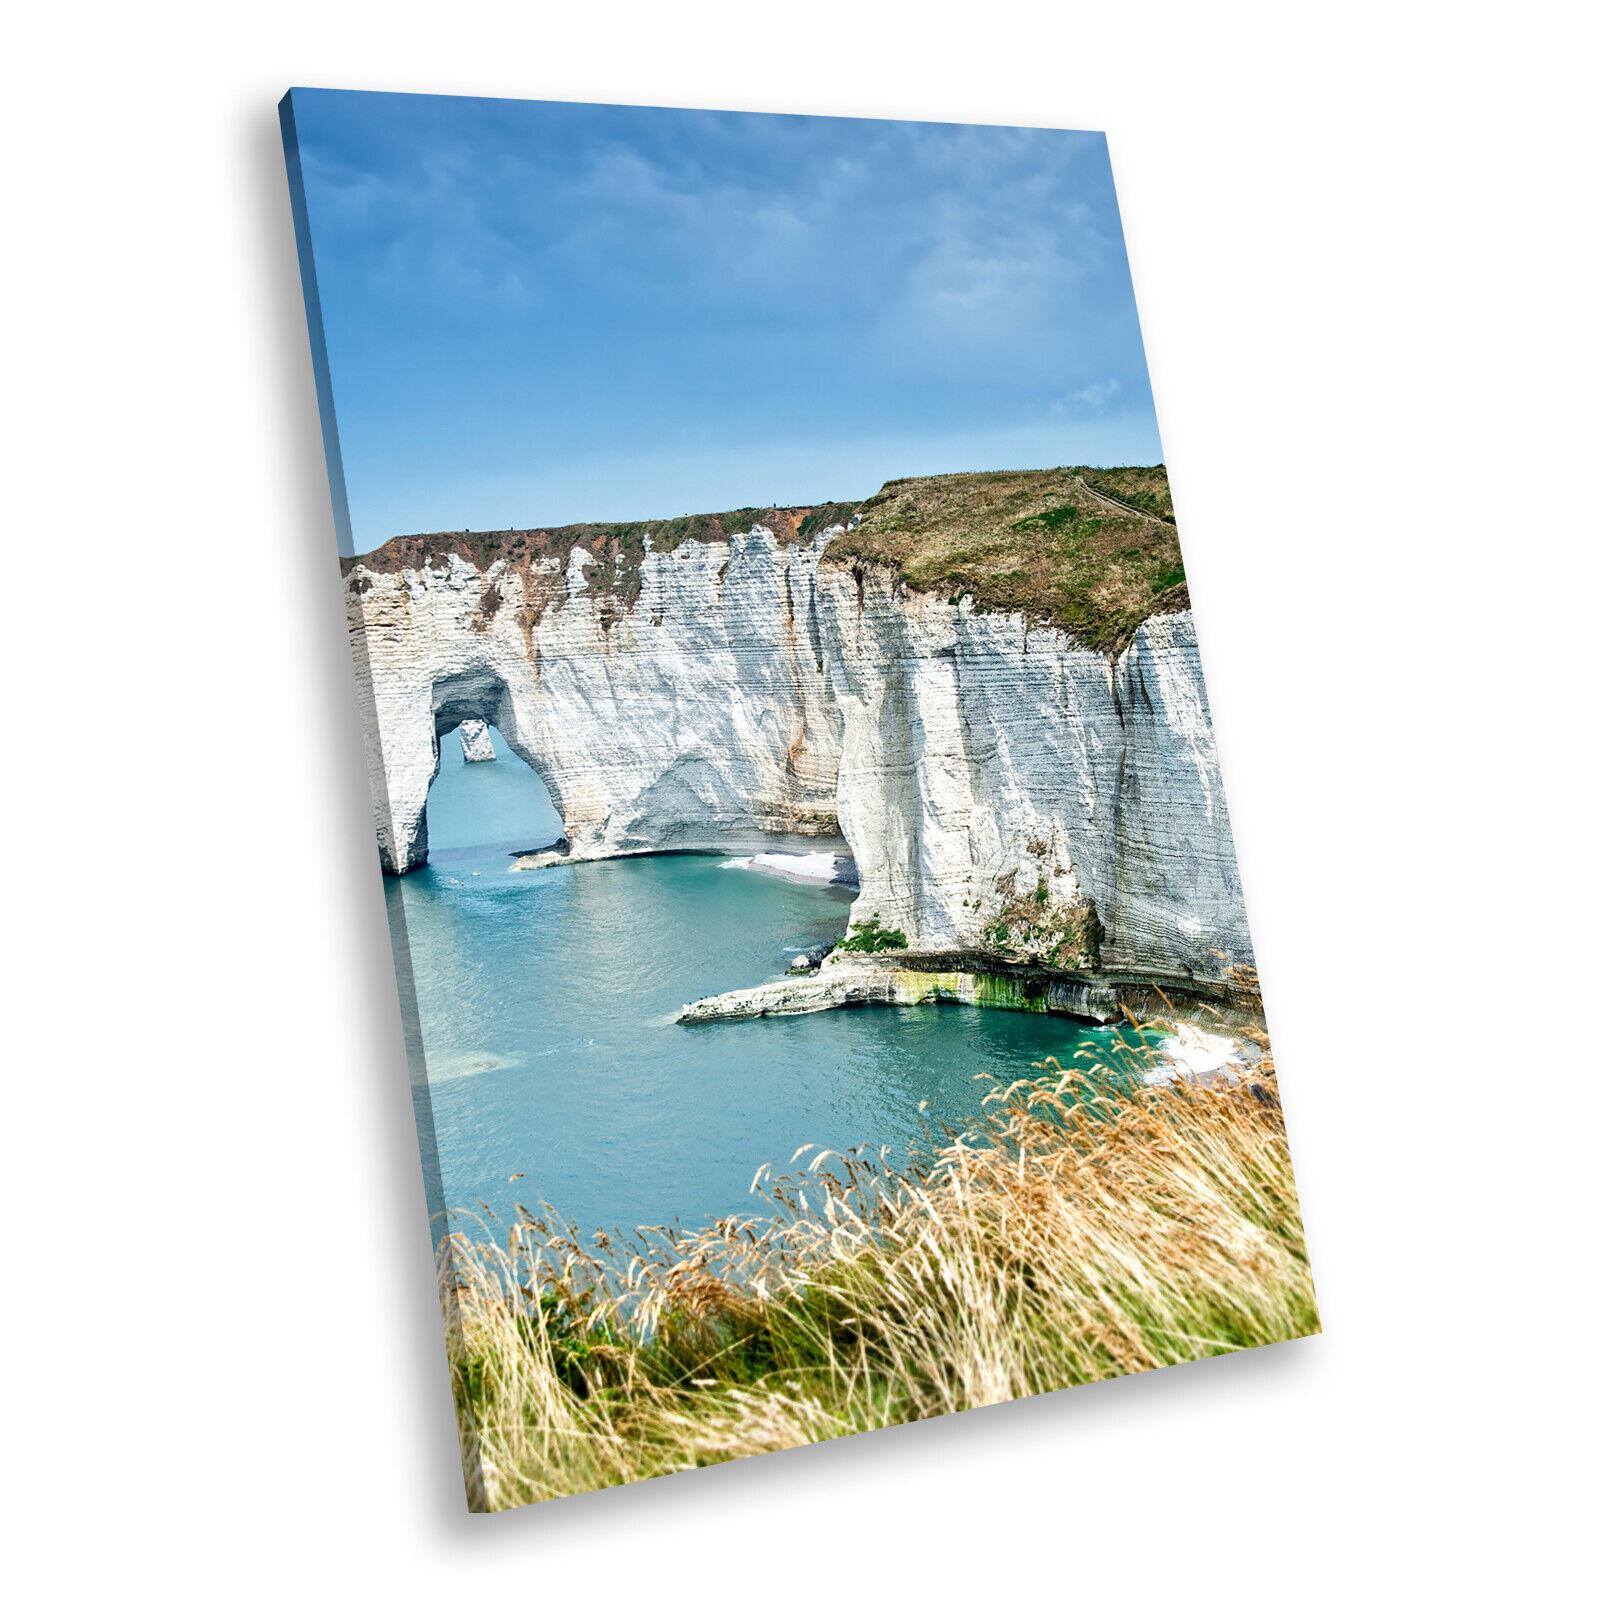 Blau Seaside Cliffs of Dover Portrait Scenic Canvas Wall Art Picture Prints